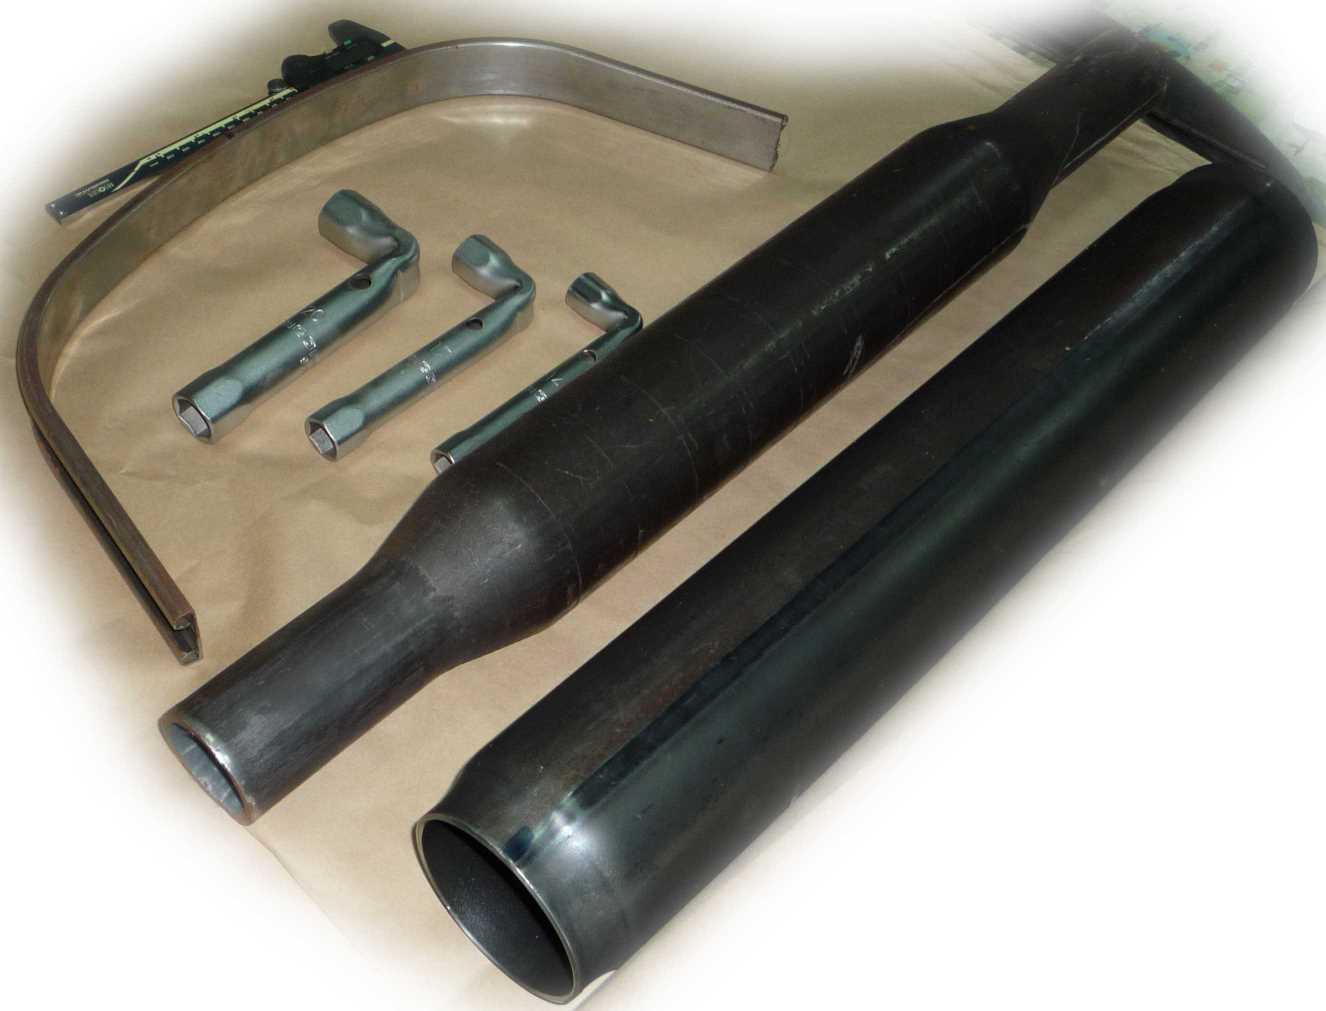 Auto Tube Pipe Aluminum Bending Machine Bender Equipment